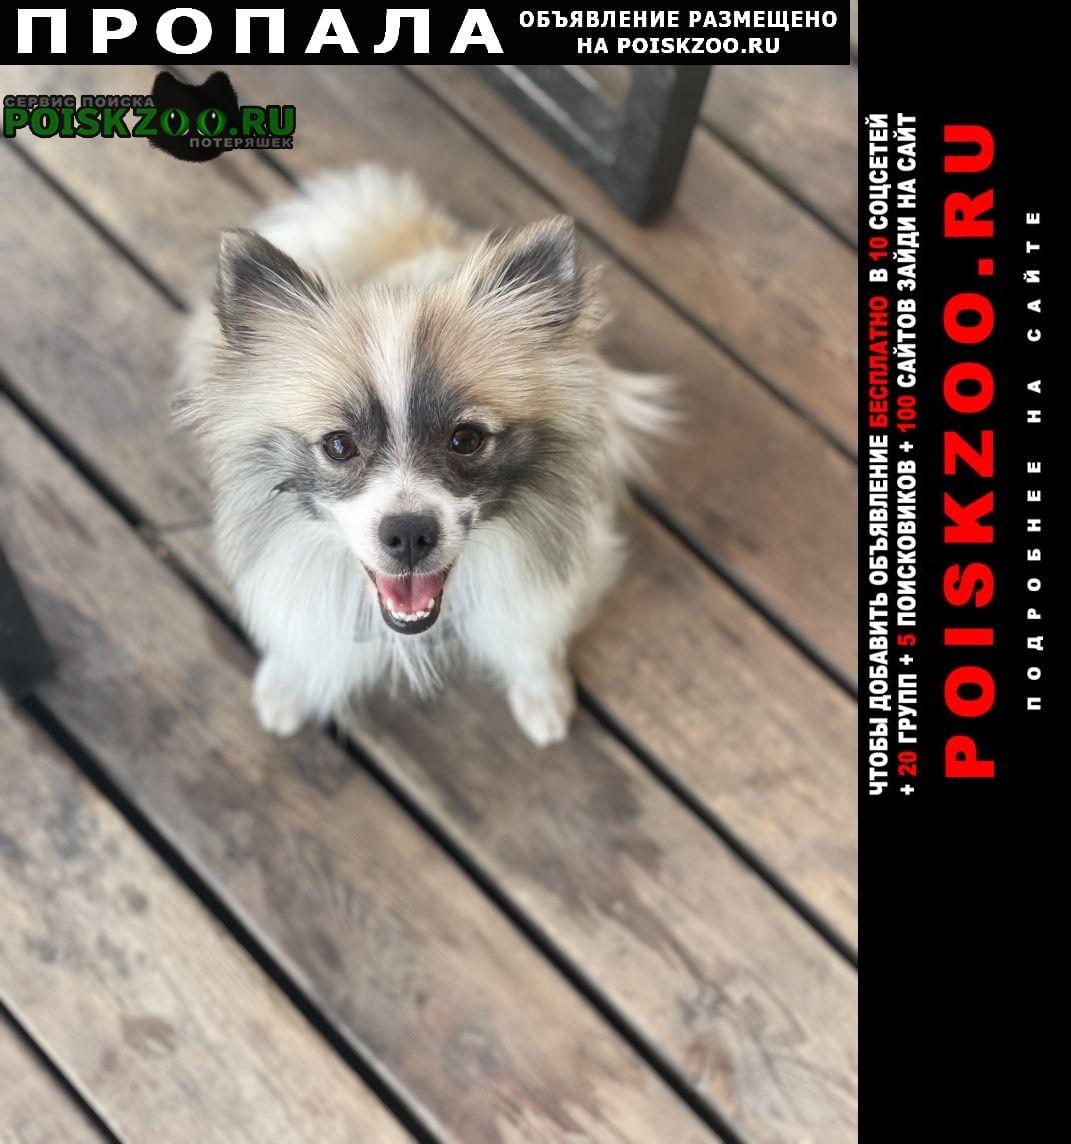 Пропала собака, метис шпица Москва